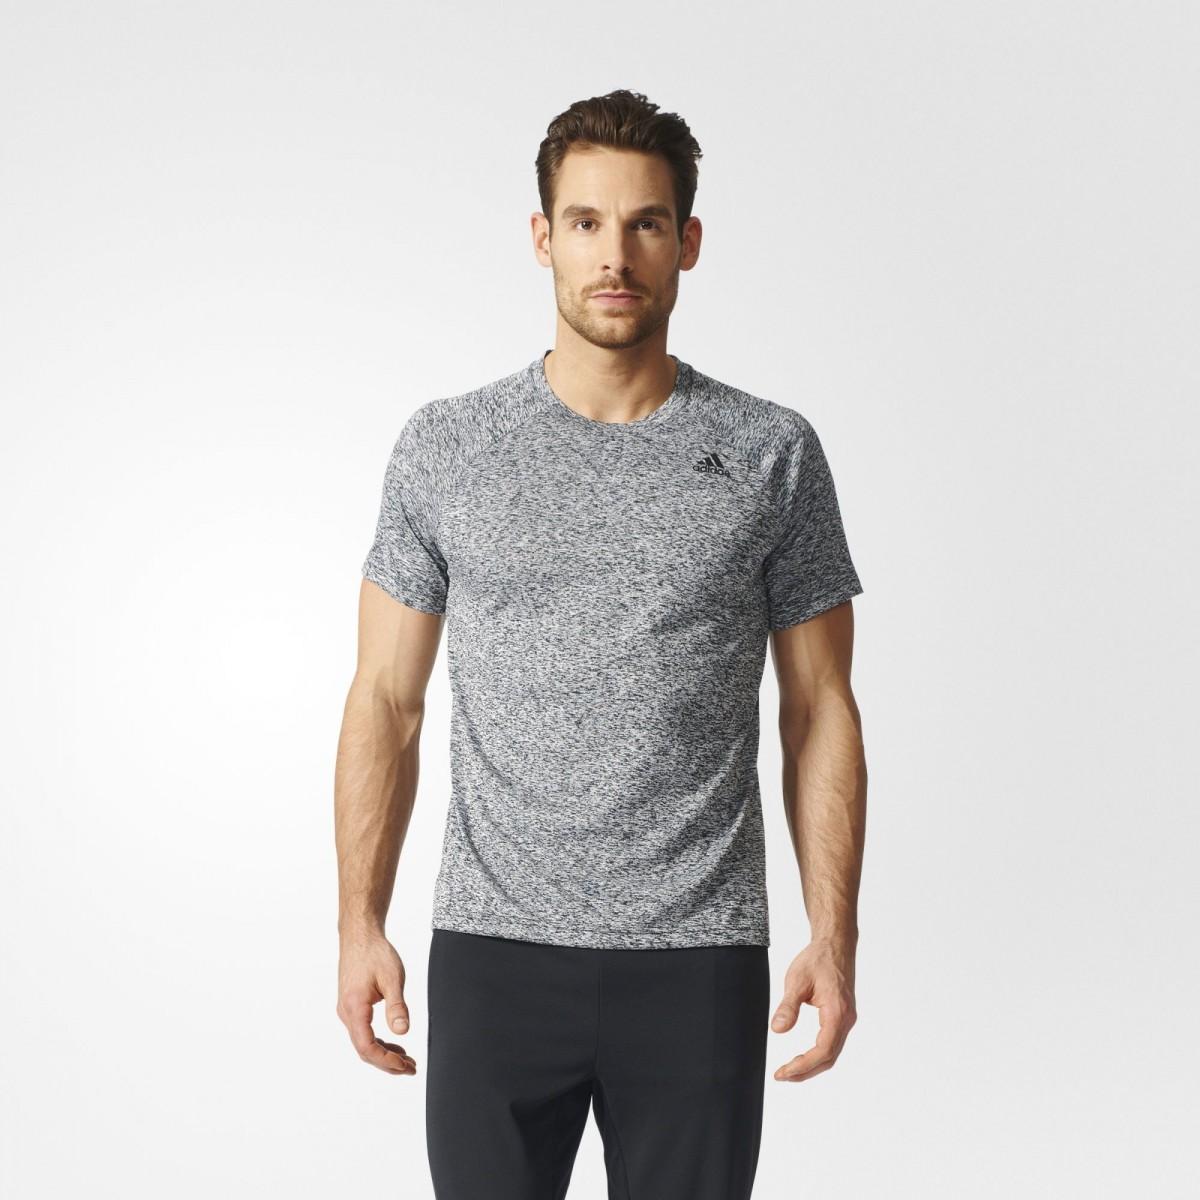 05fa5c886c4 Bizz Store - Camiseta Masculina Adidas D2M Heathered Manga Curta